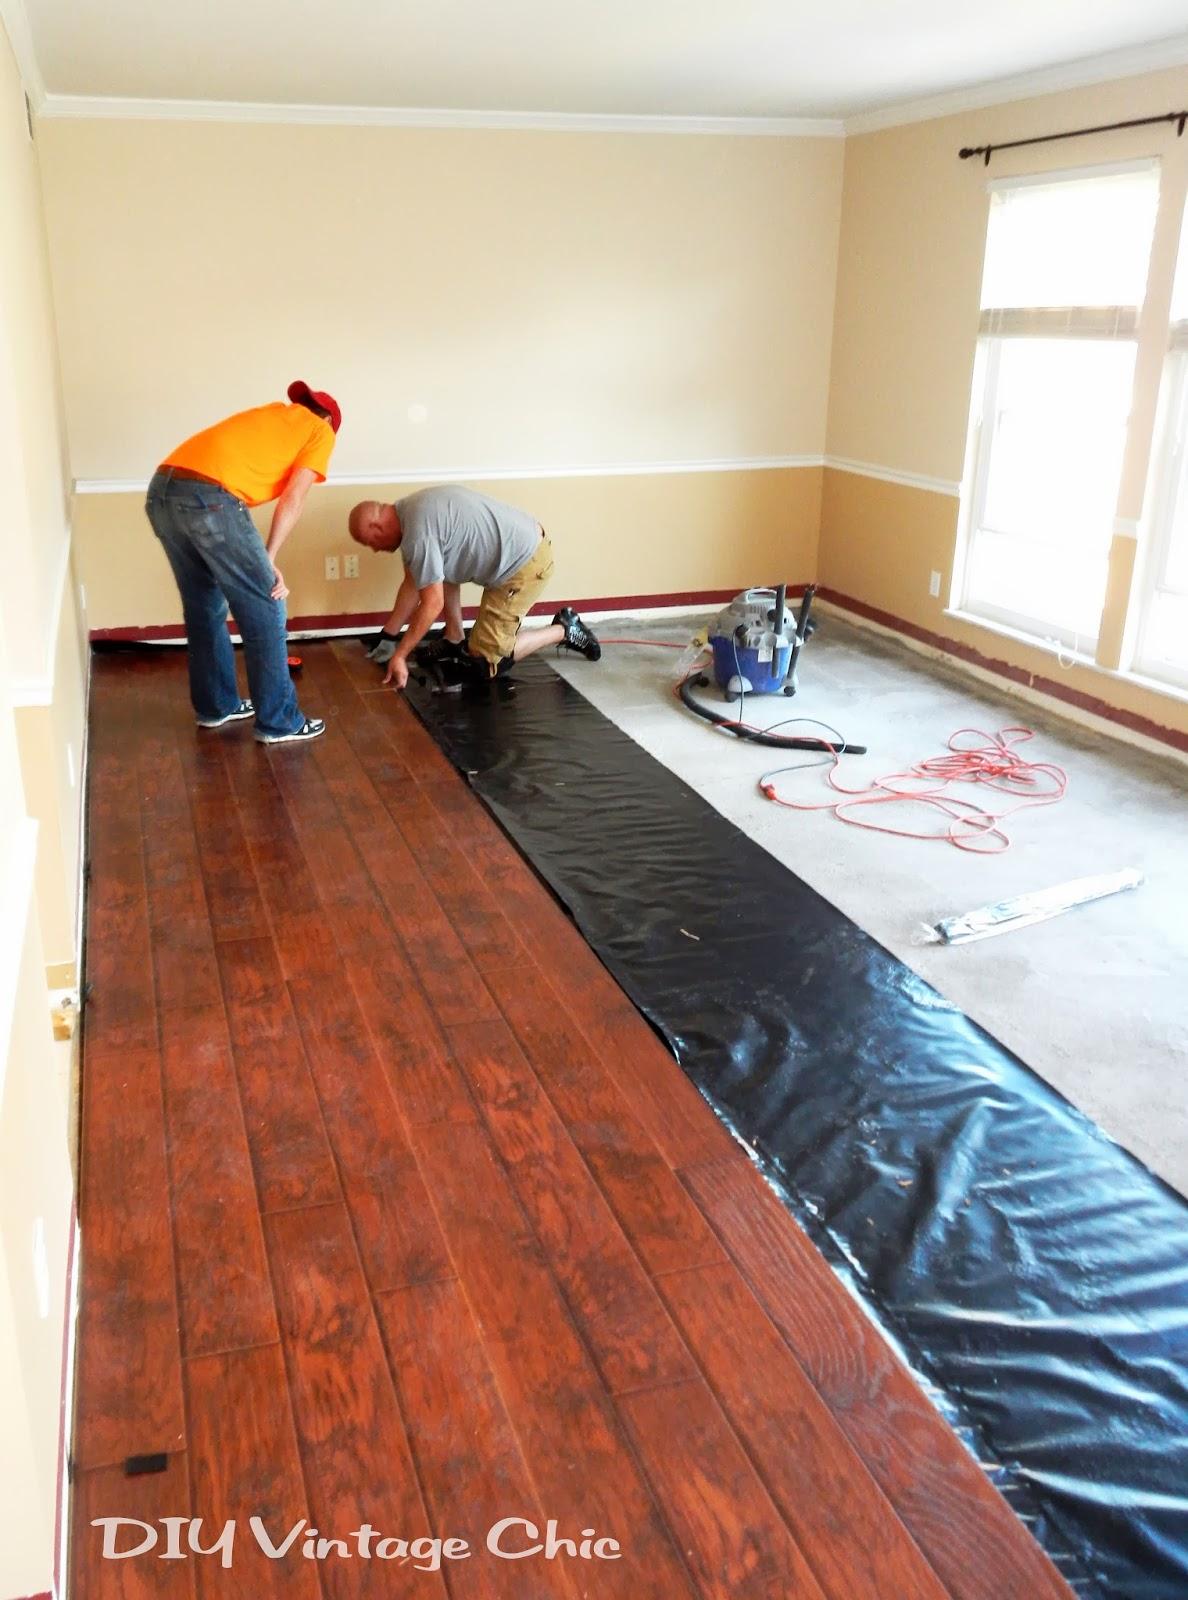 Diy Vintage Chic Diy Laminate Flooring